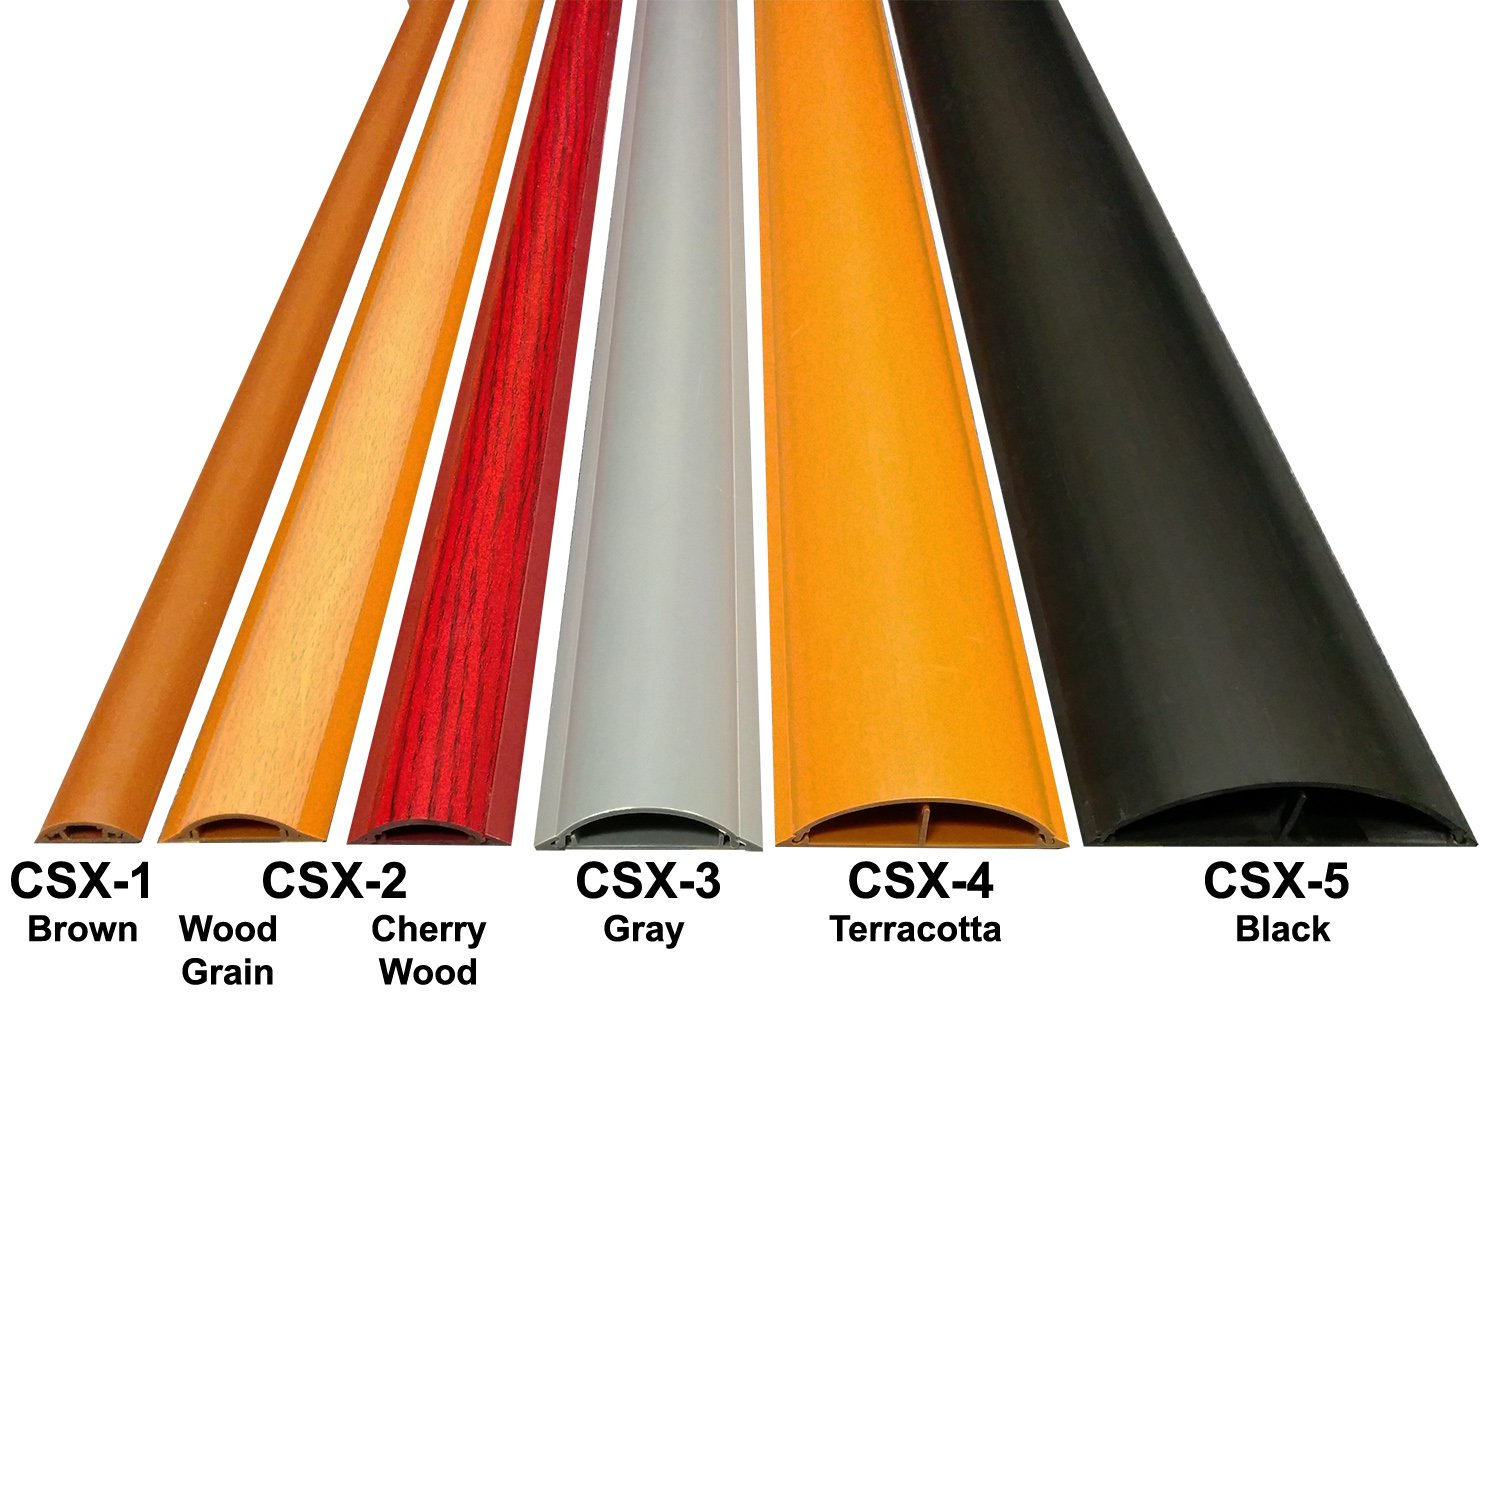 Amazon.com: Cable Shield Cord Cover - Model: CSX-2 - Length: 31